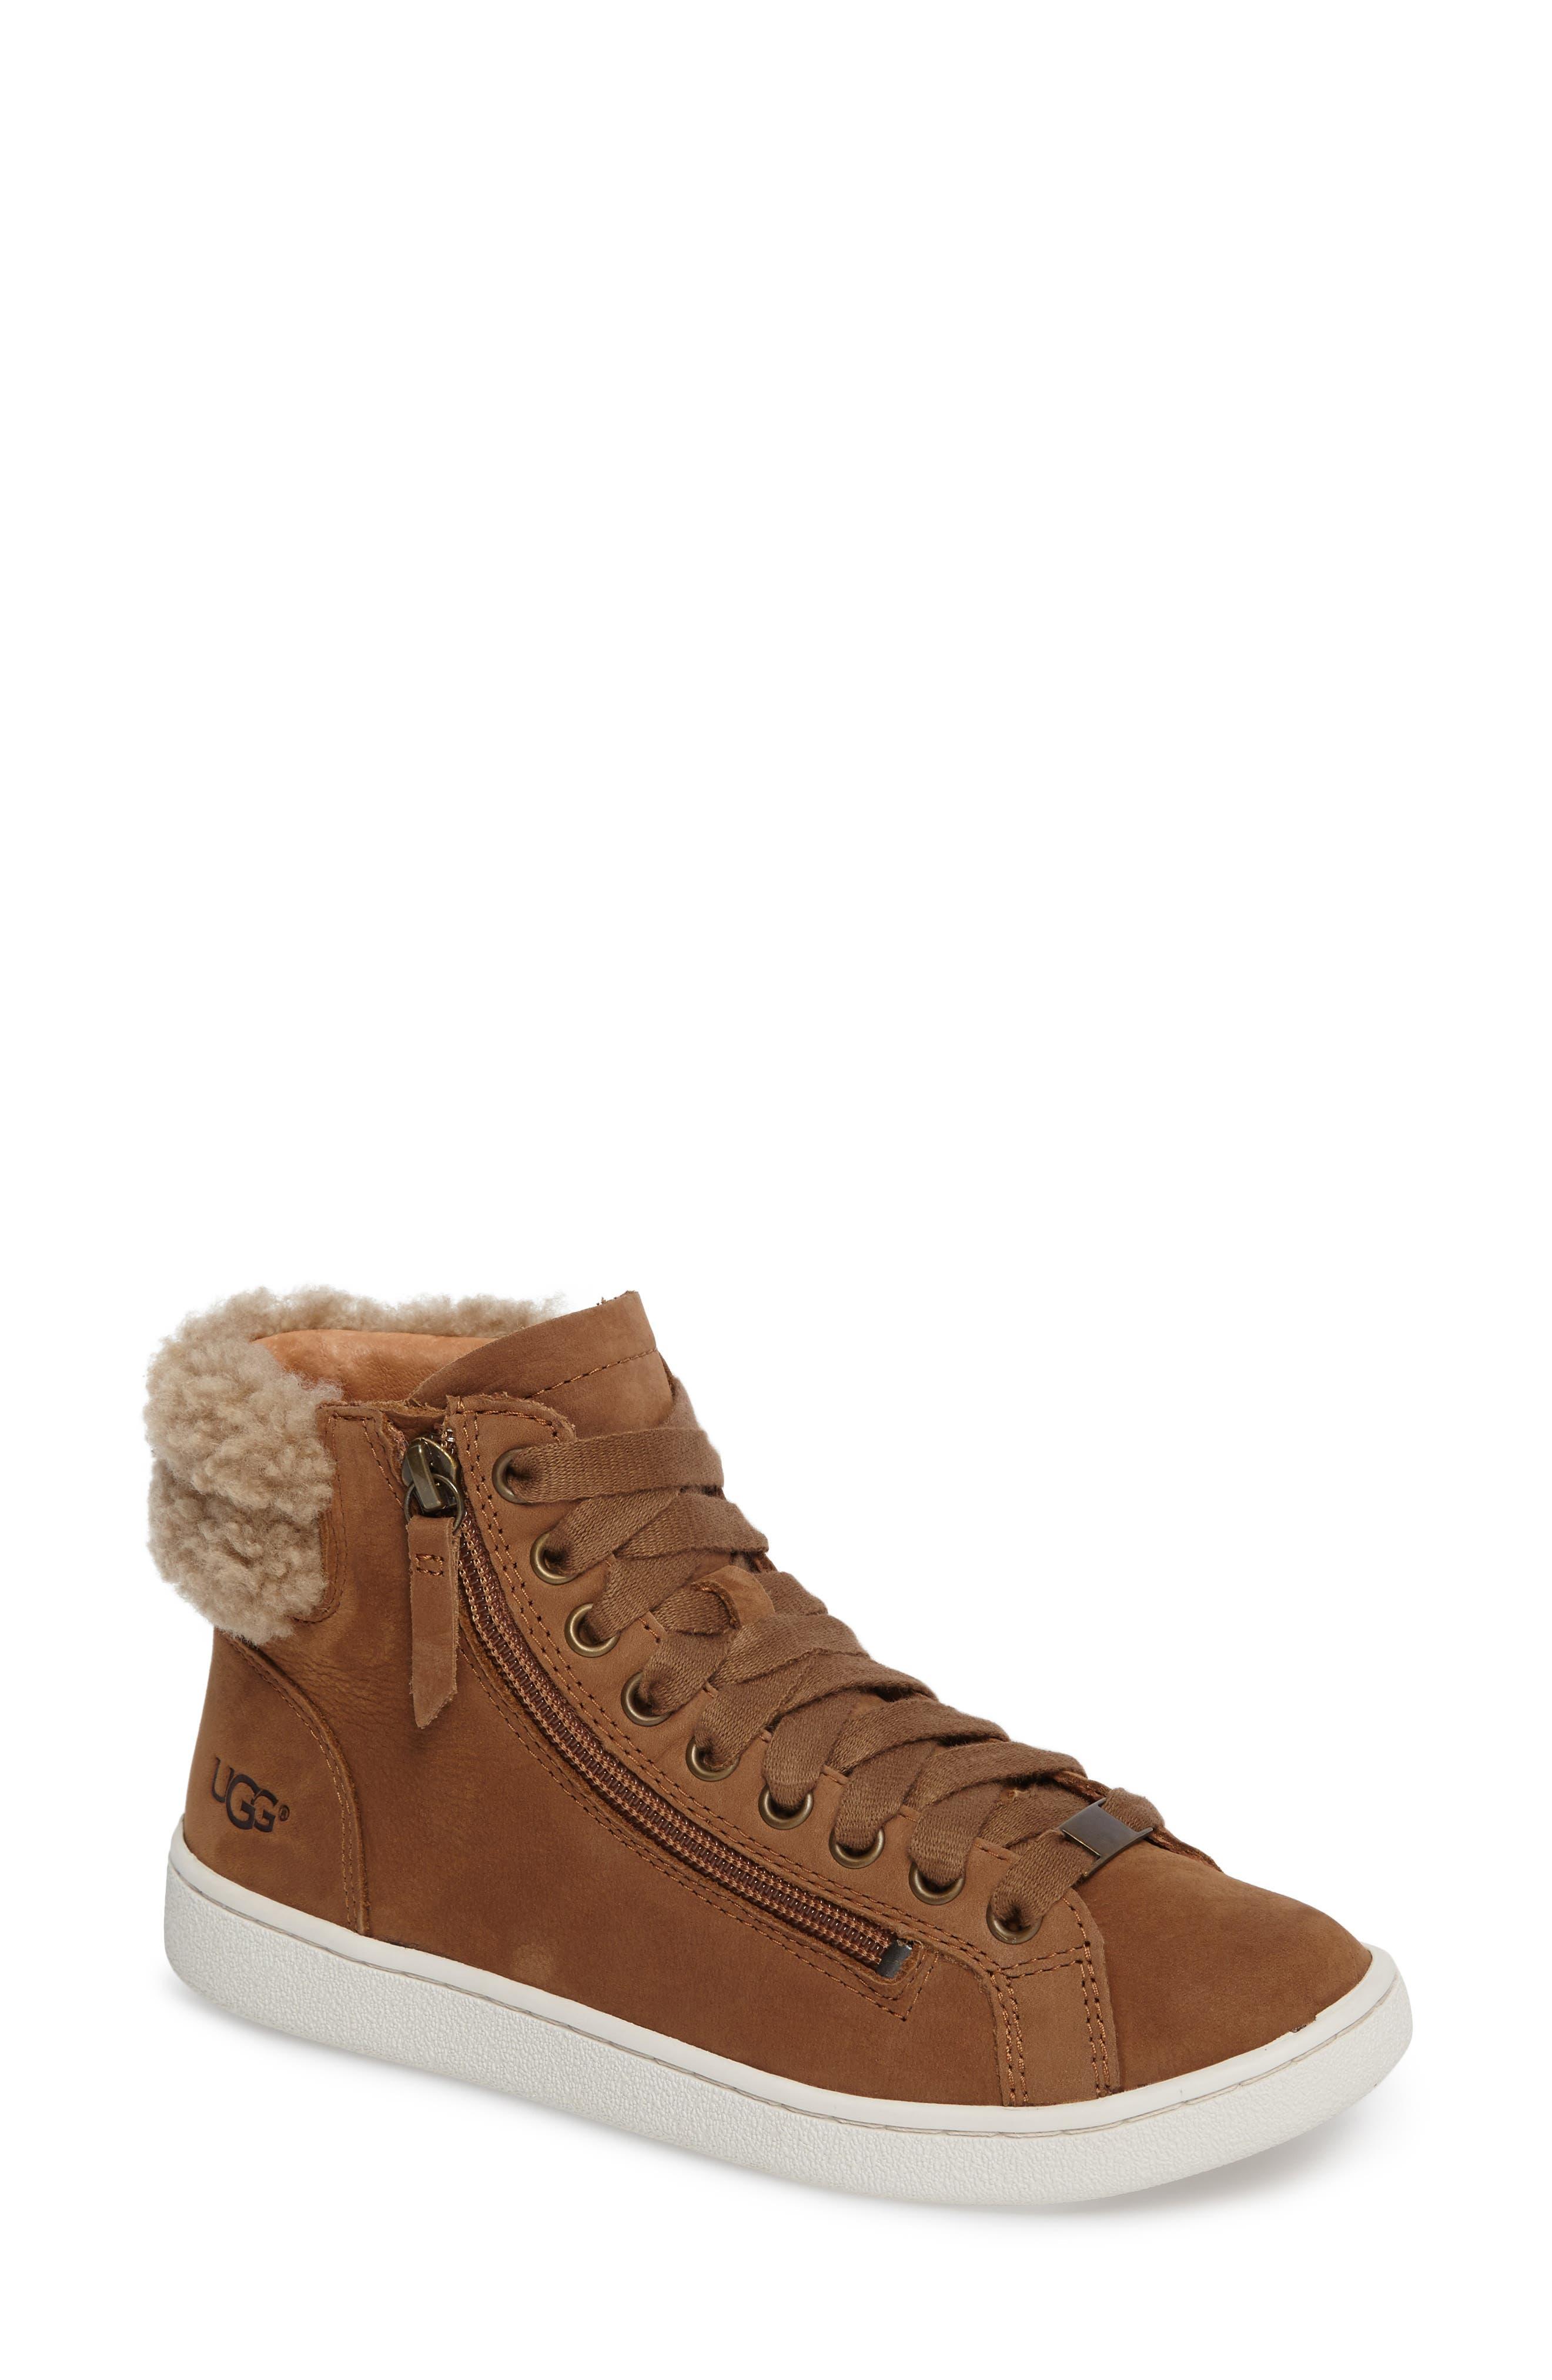 Main Image - UGG® Olive Genuine Shearling Cuff Sneaker (Women)